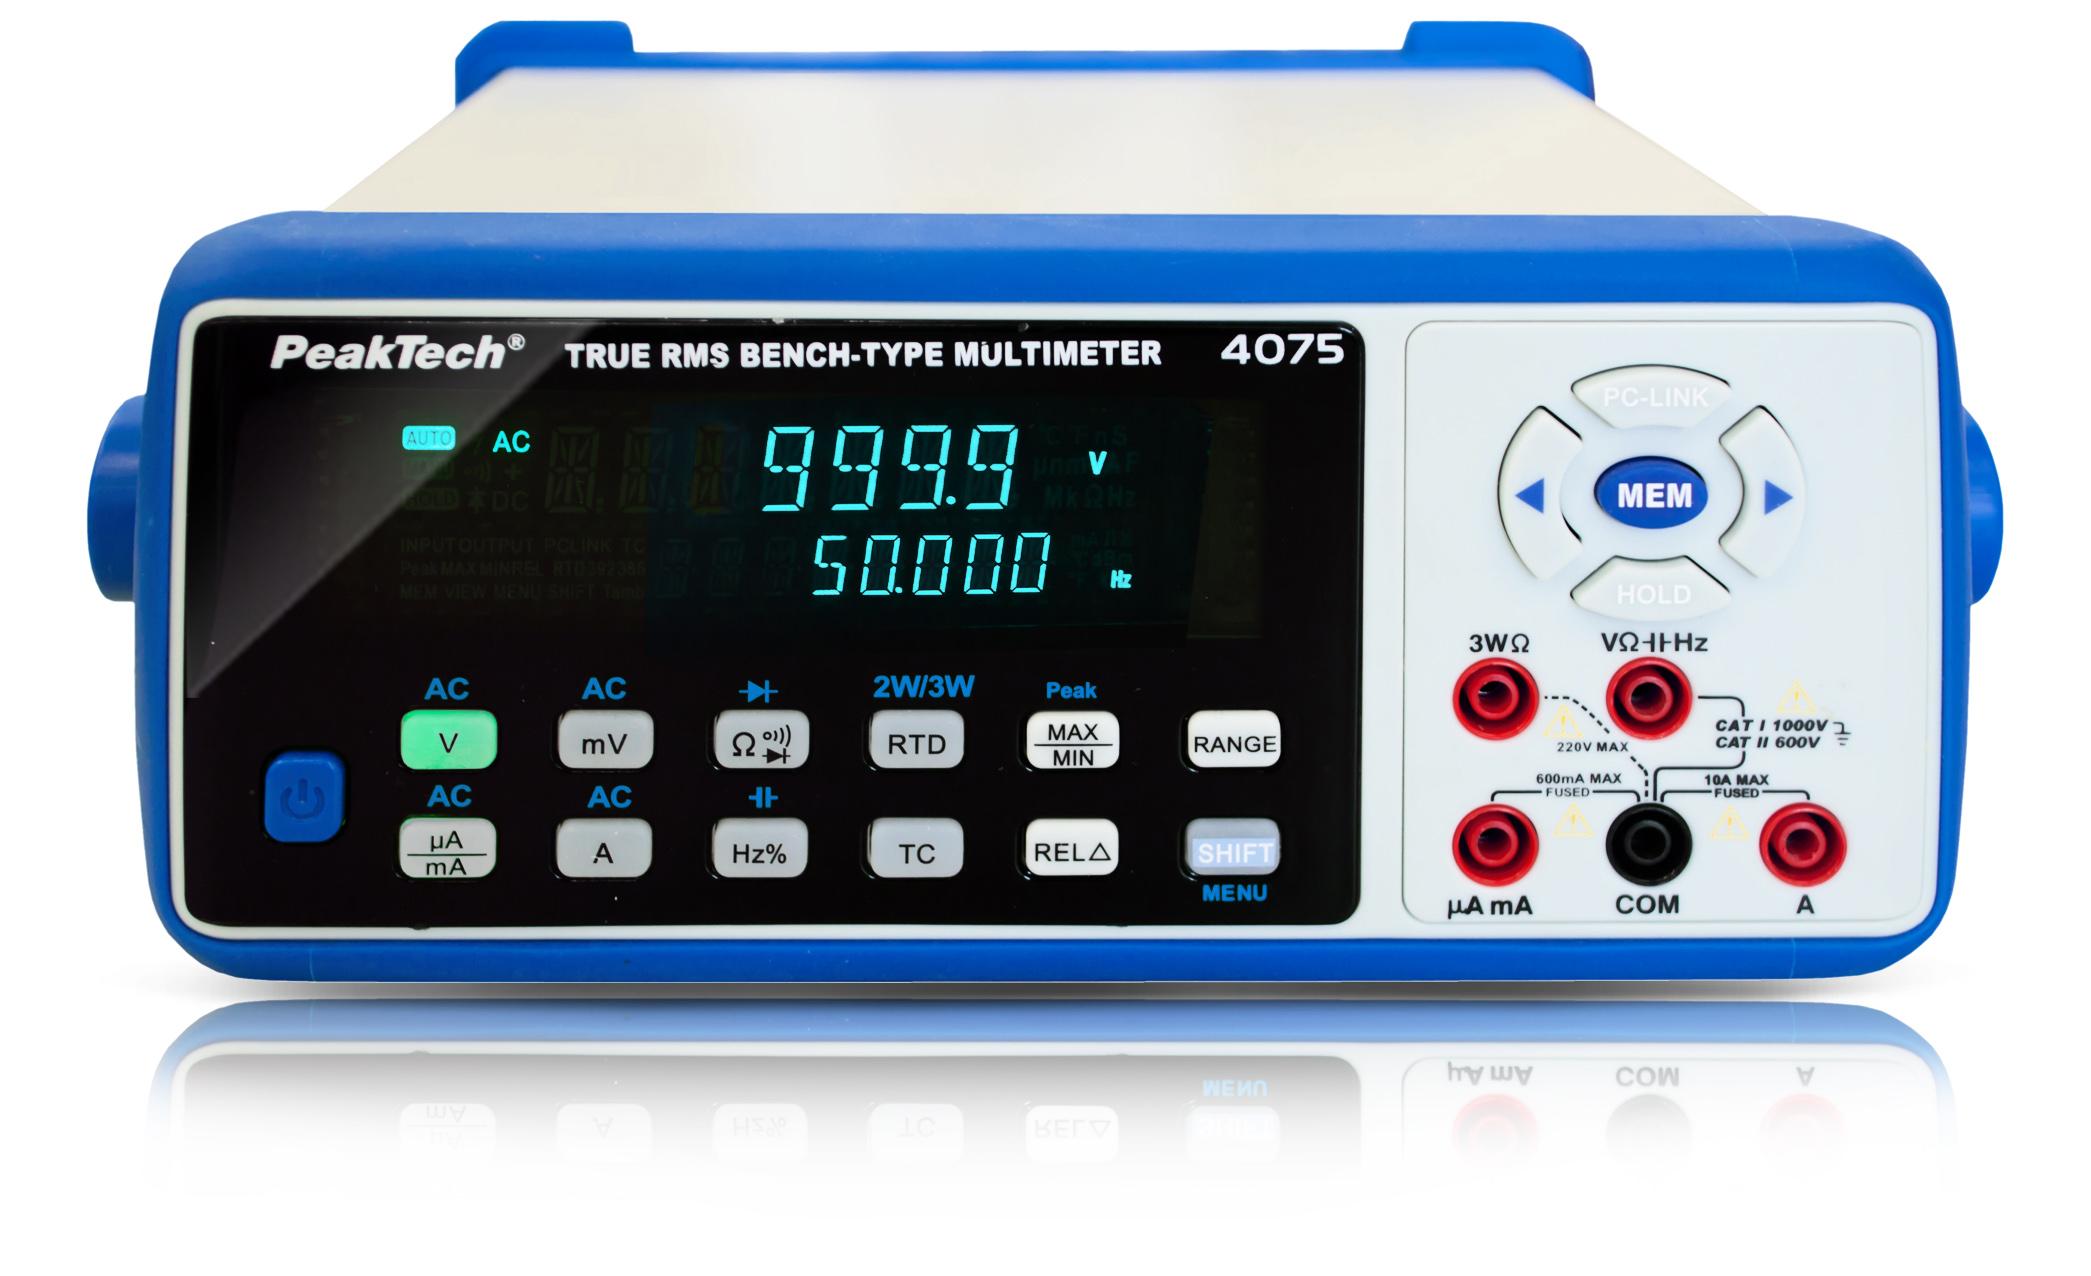 «PeakTech® P 4075» Digital bench multimeter, 63,000 counts